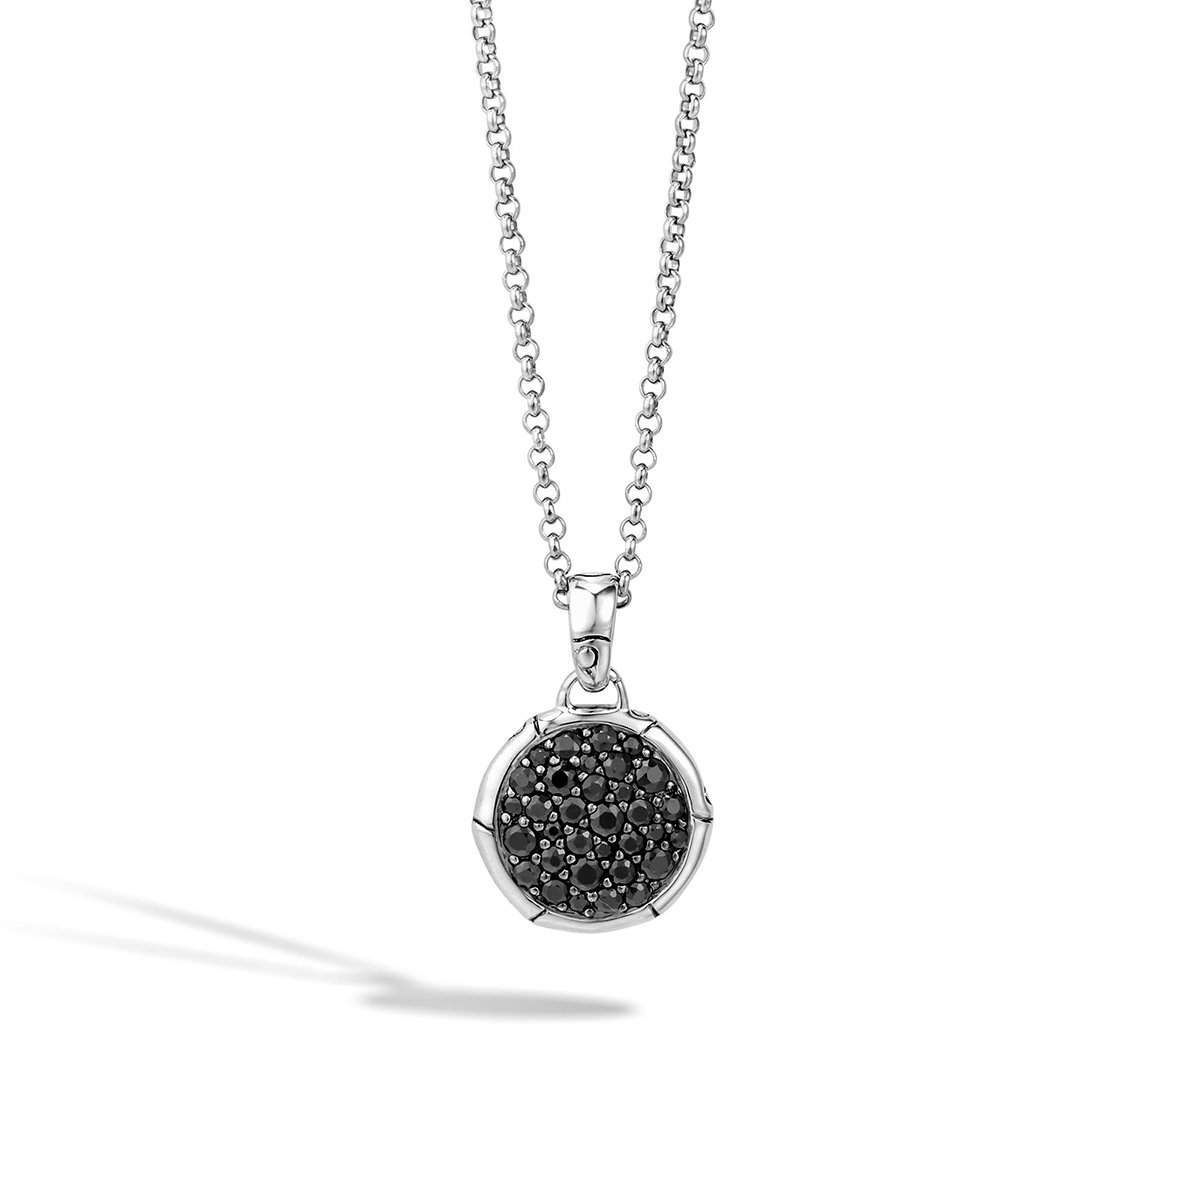 John Hardy Interlinking Pendant Necklace With Black Sapphire 2bybdauh